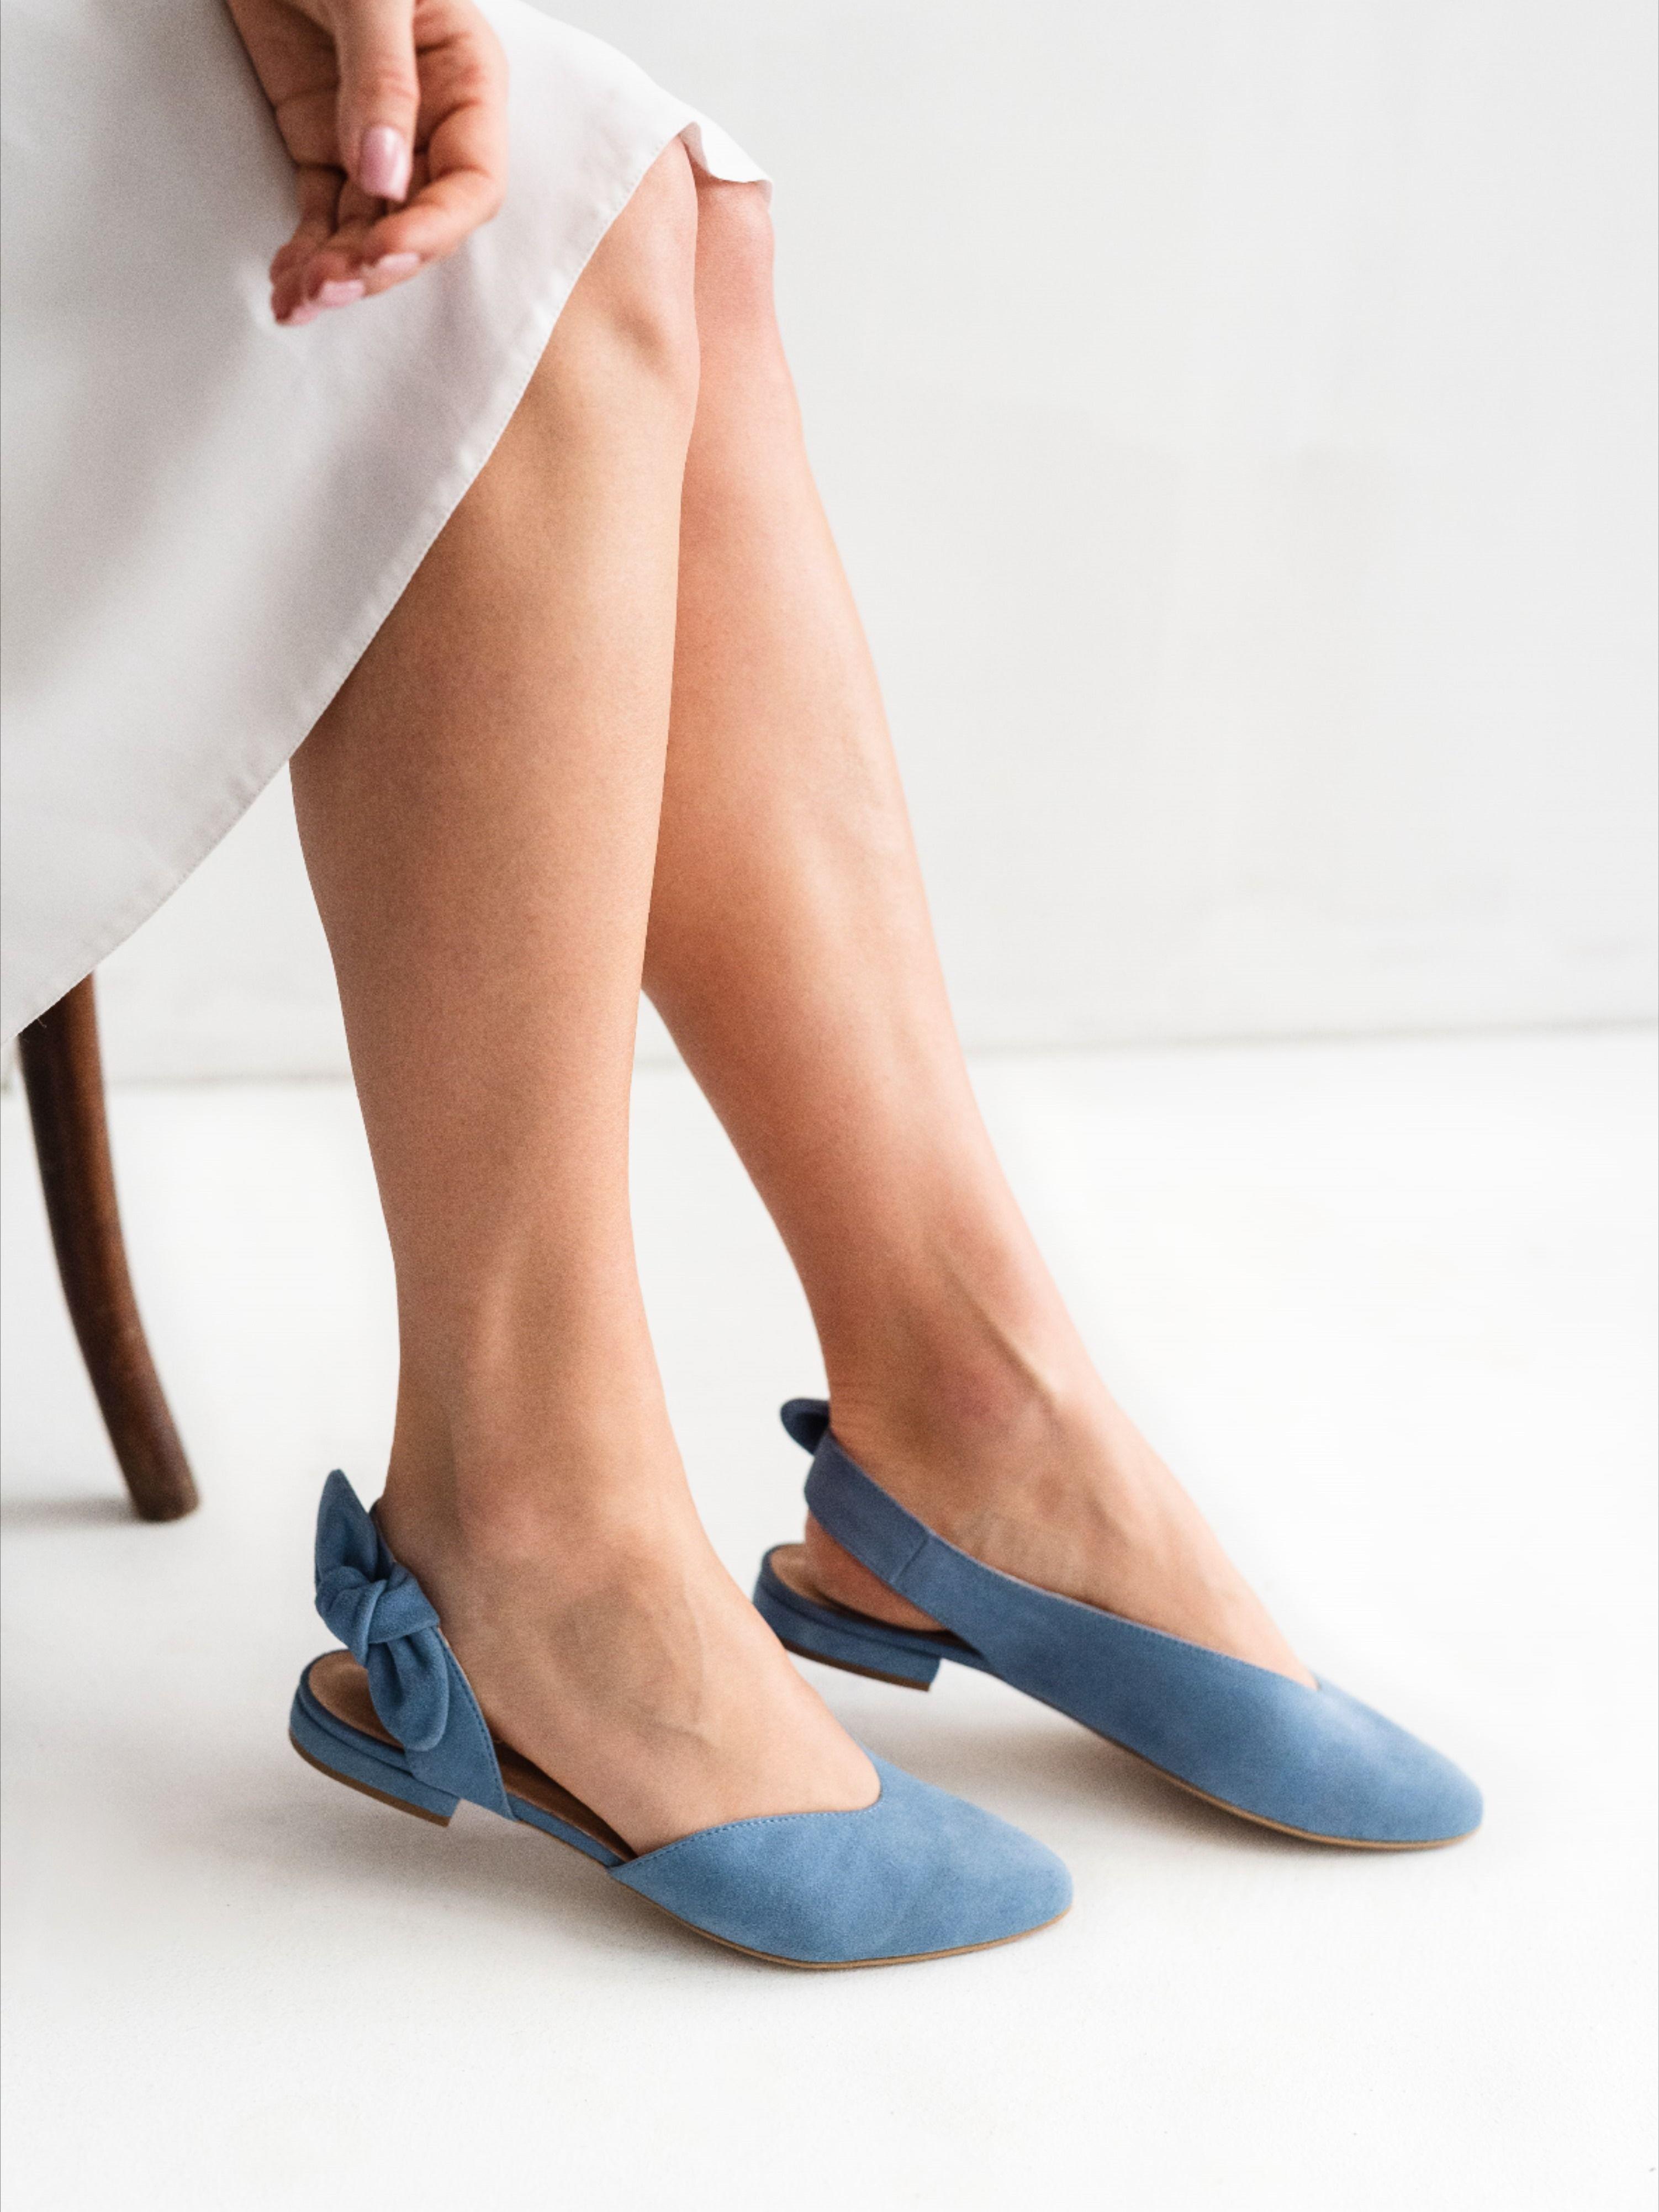 Na Co Zwrocic Uwage Przy Kupnie Butow Na Slub Heels Shoes Kitten Heels